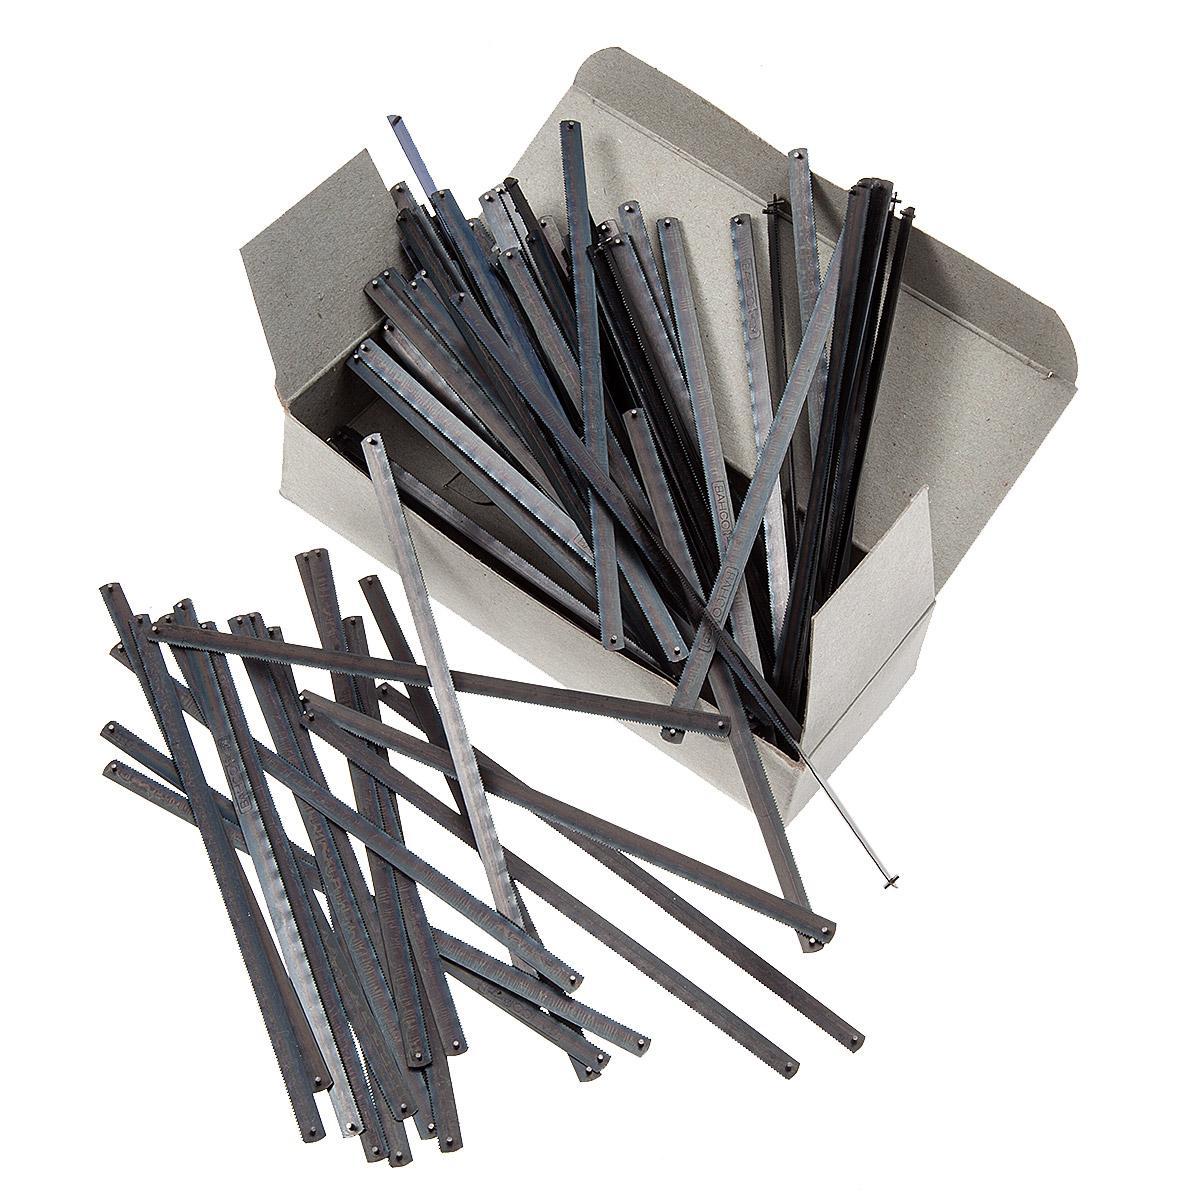 Sandvik Junior Hacksaw Blades 228-32-100P lowest price